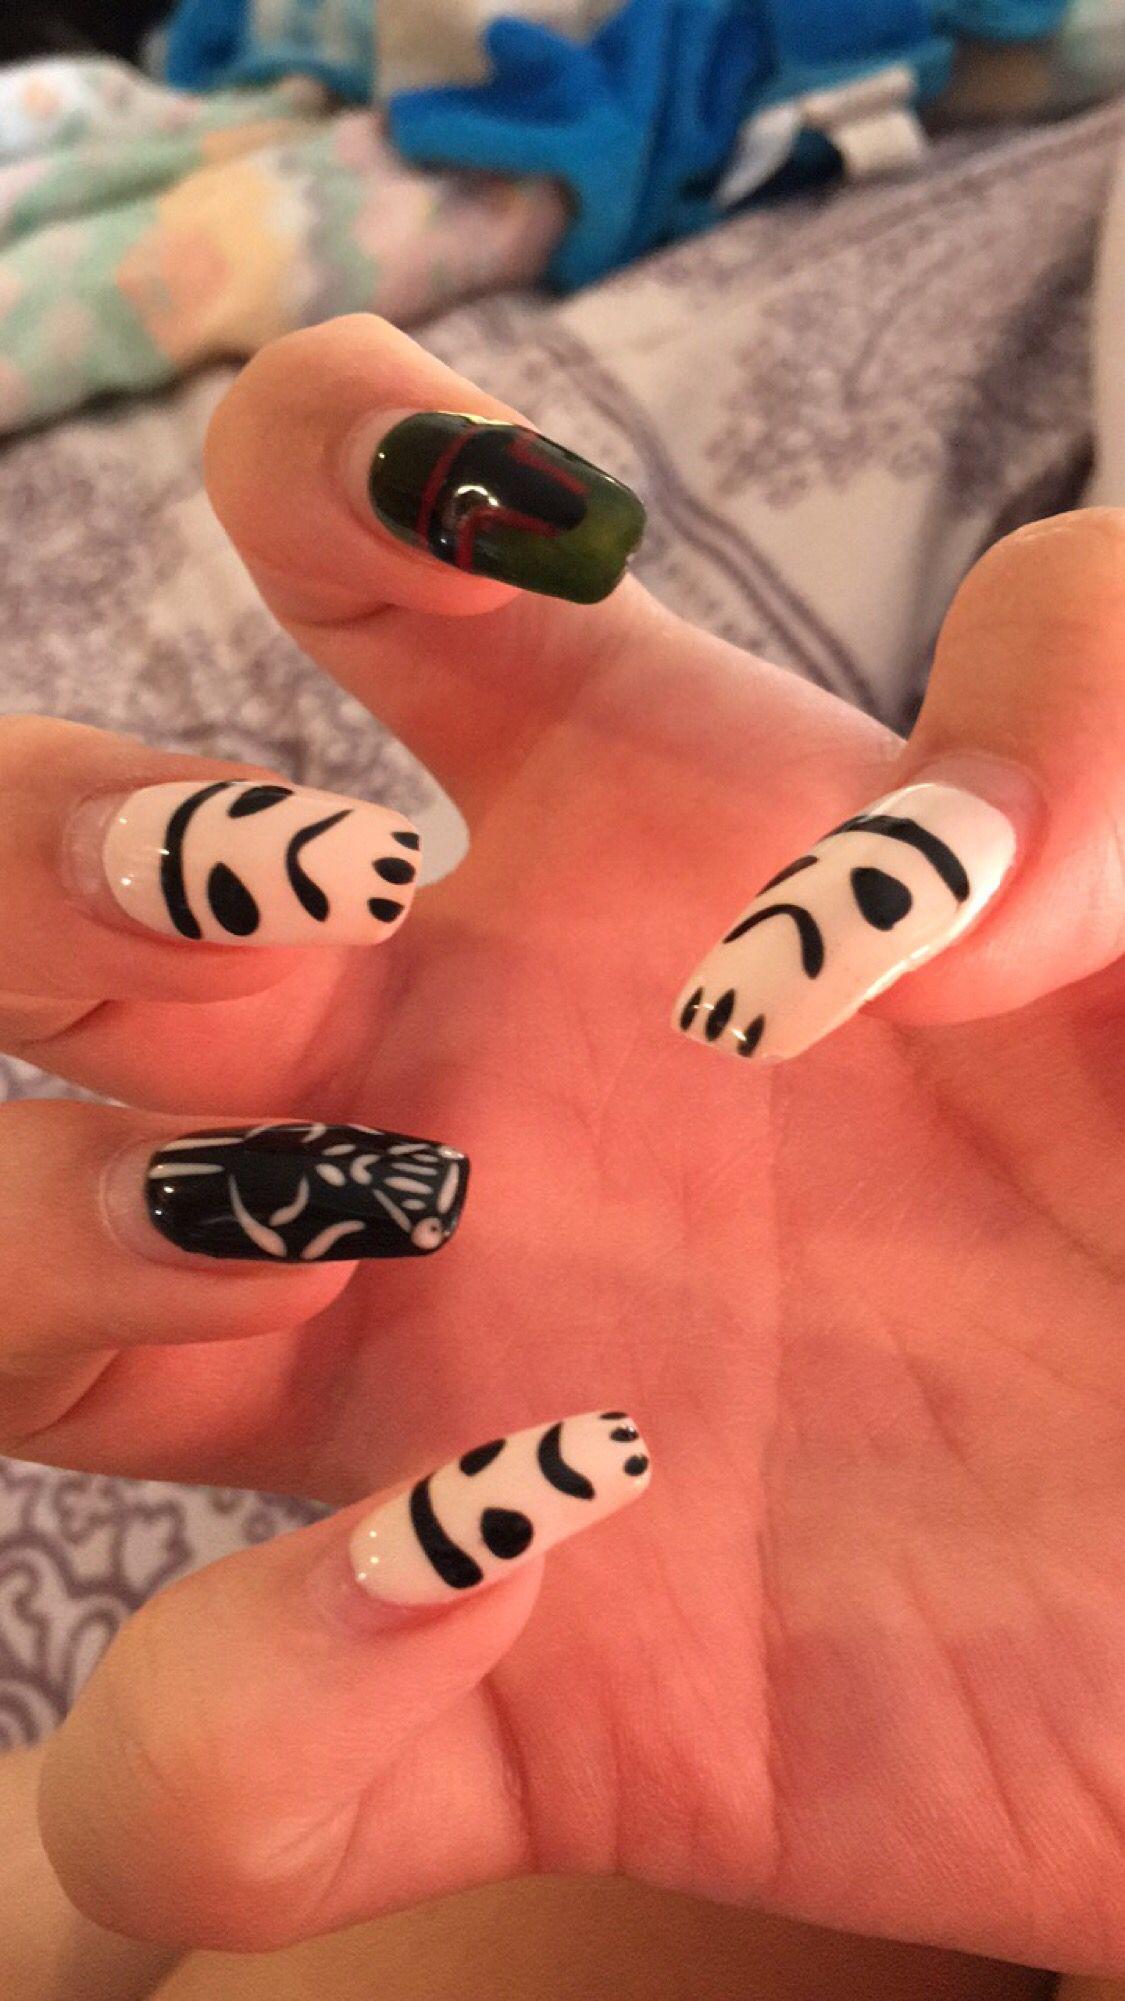 Star Wars Nail Art, Storm Trooper, Darth Vader, Boba Fett | Nails ...